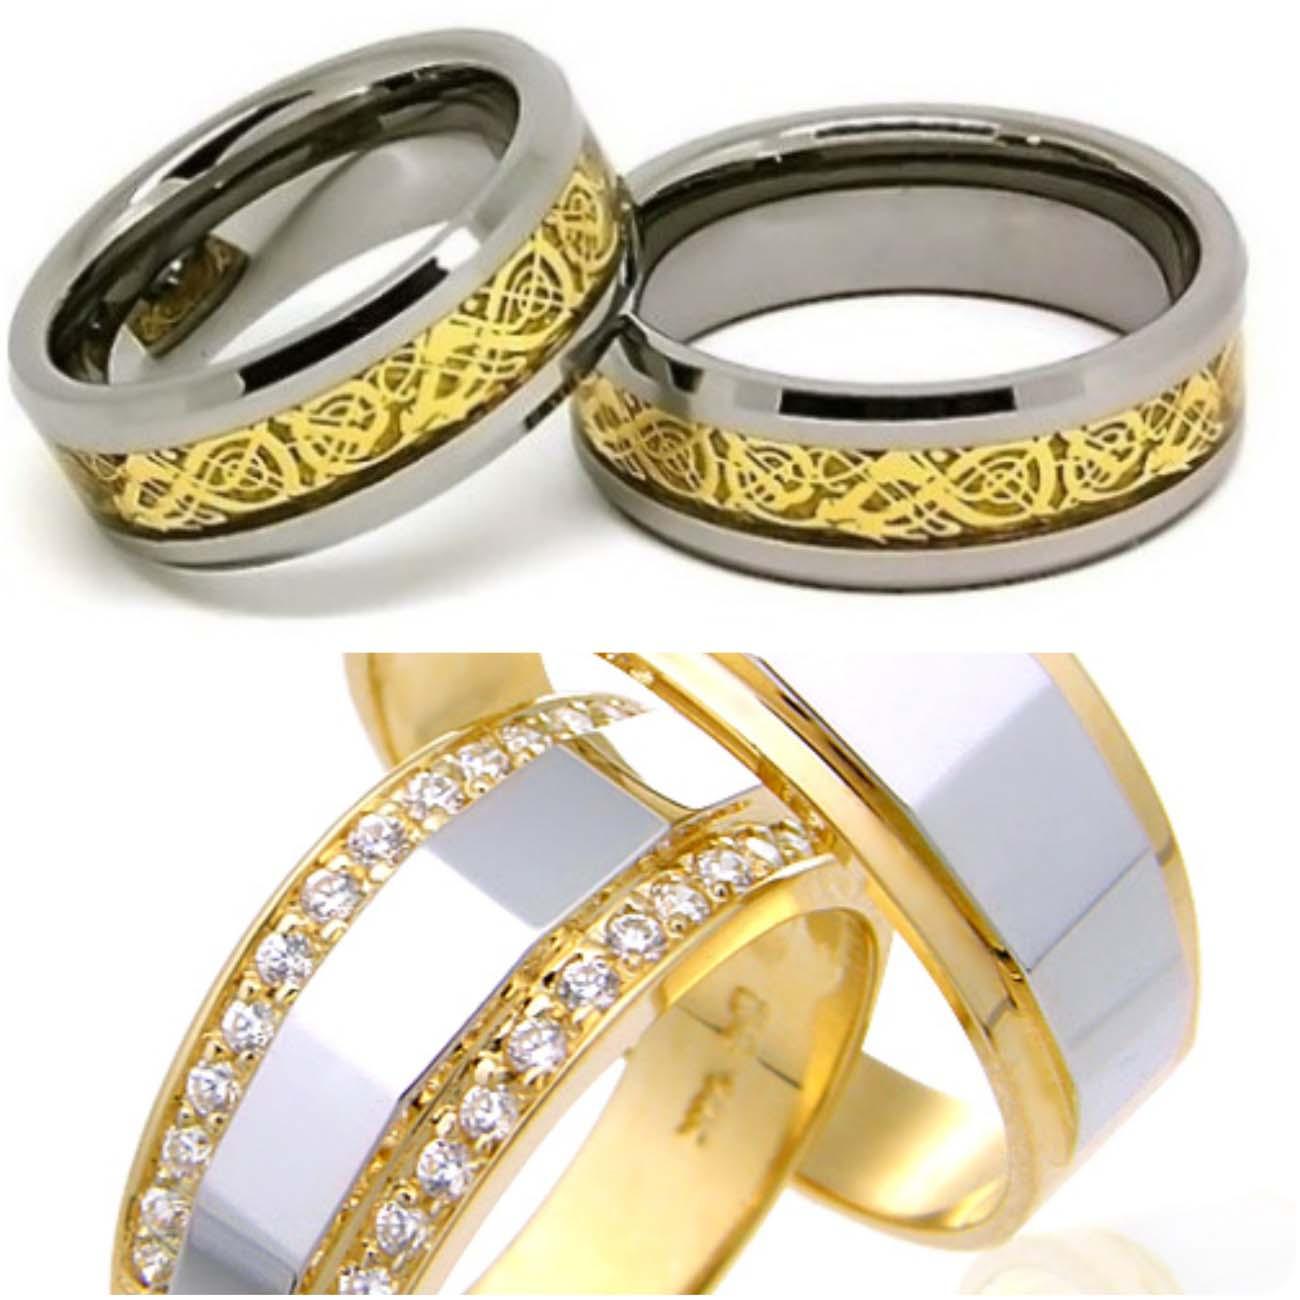 New Wedding Ring Designs Wedding Rings Design Ideas